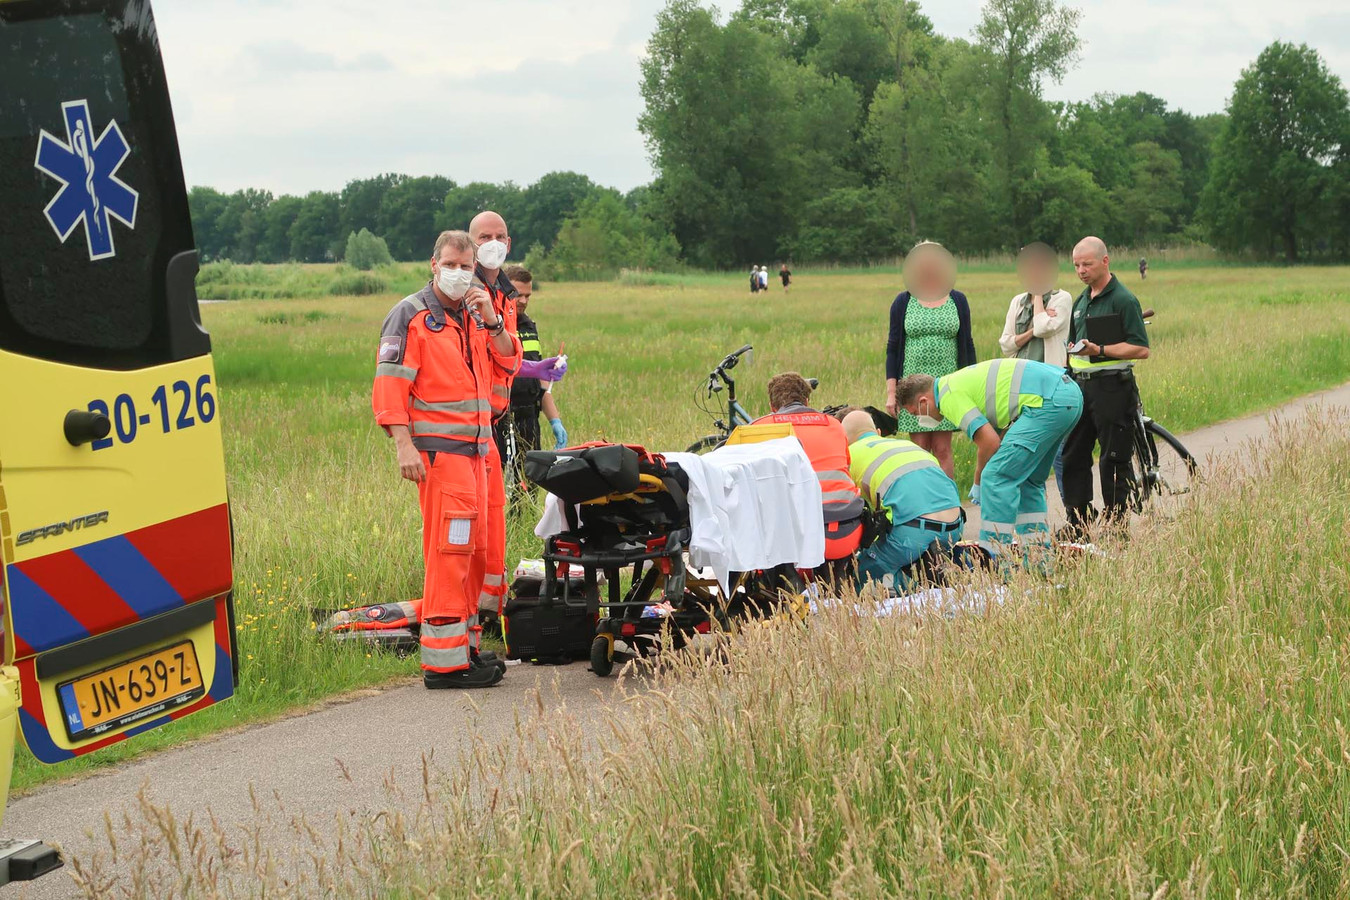 Wielrenner ernstig gewond na botsing met fietser in Breda.